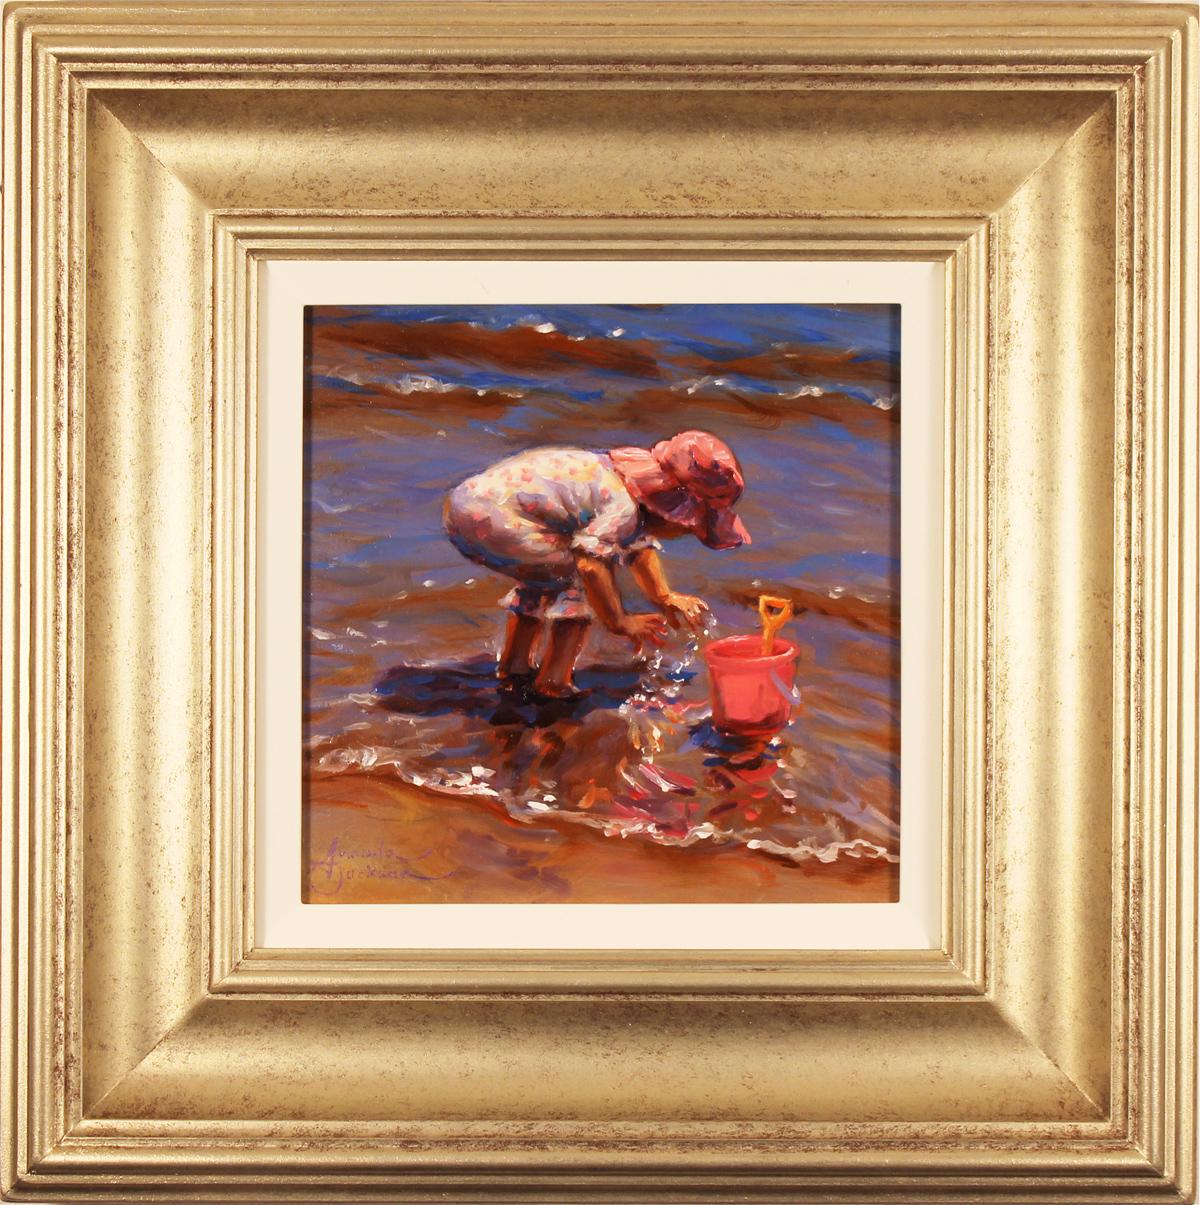 Amanda Jackson, Original oil painting on panel, Splish Splash Click to enlarge